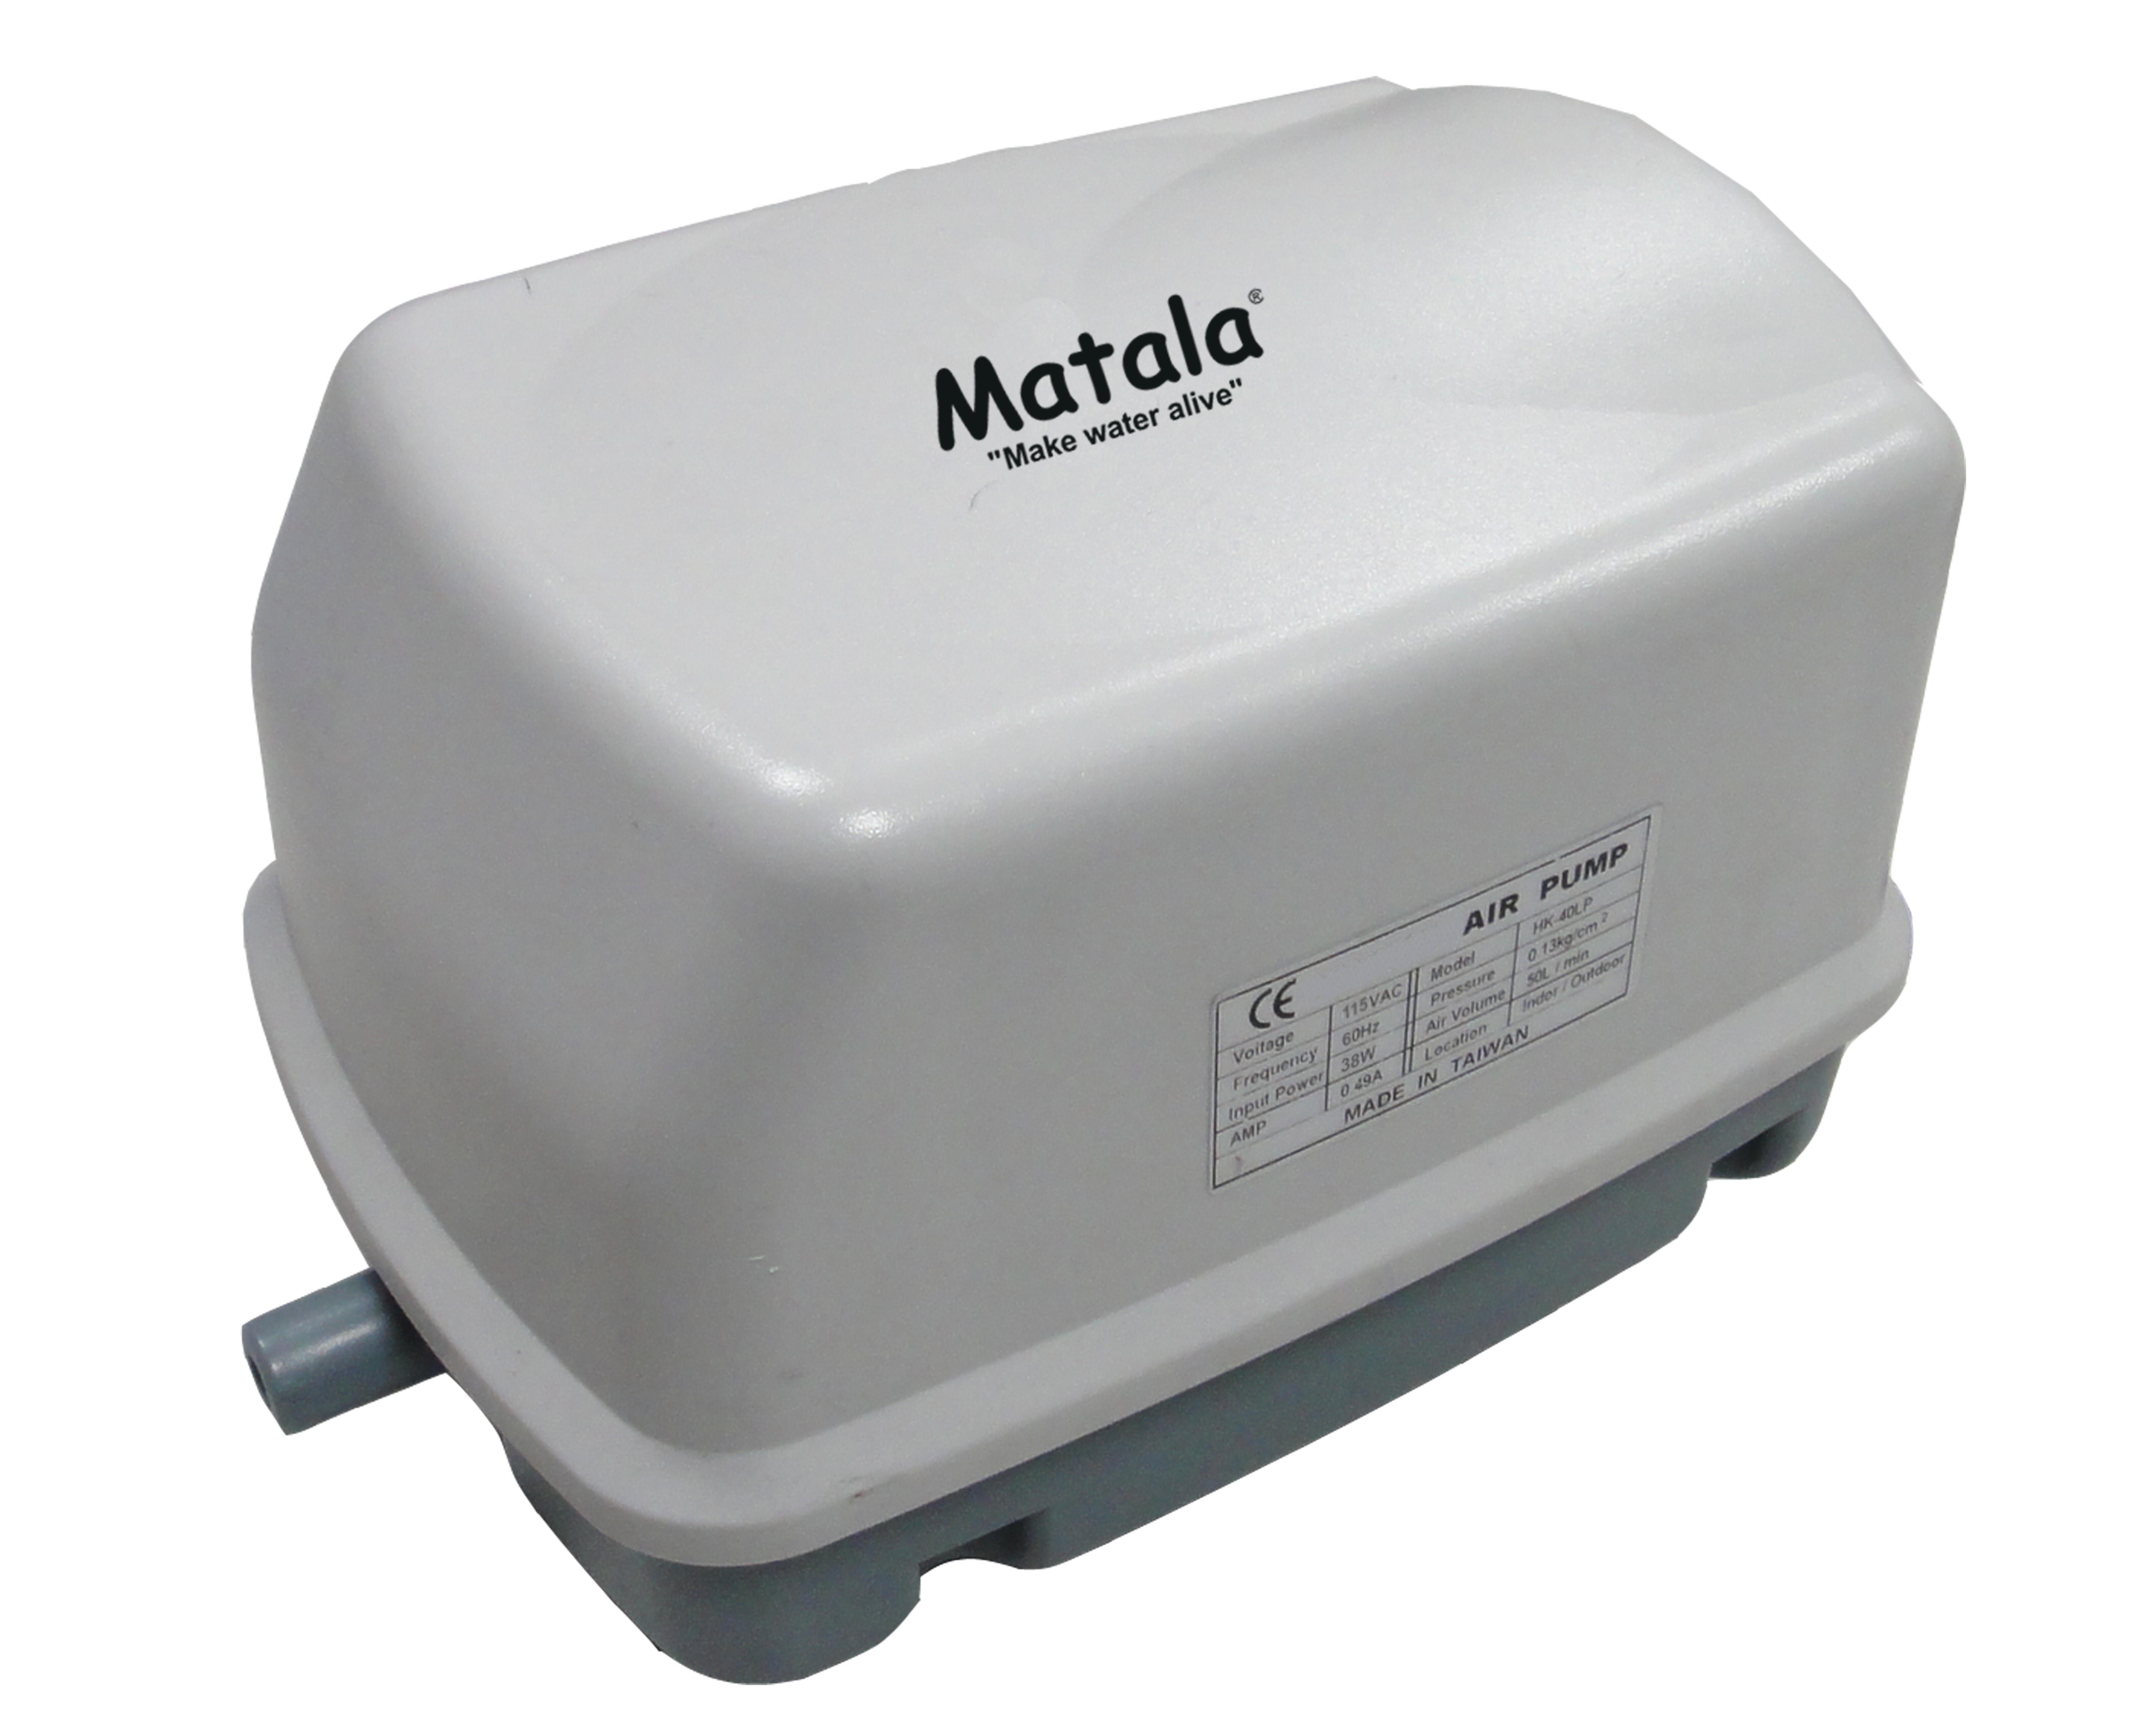 Matala Hakko HK-40LP Linear Air Pump